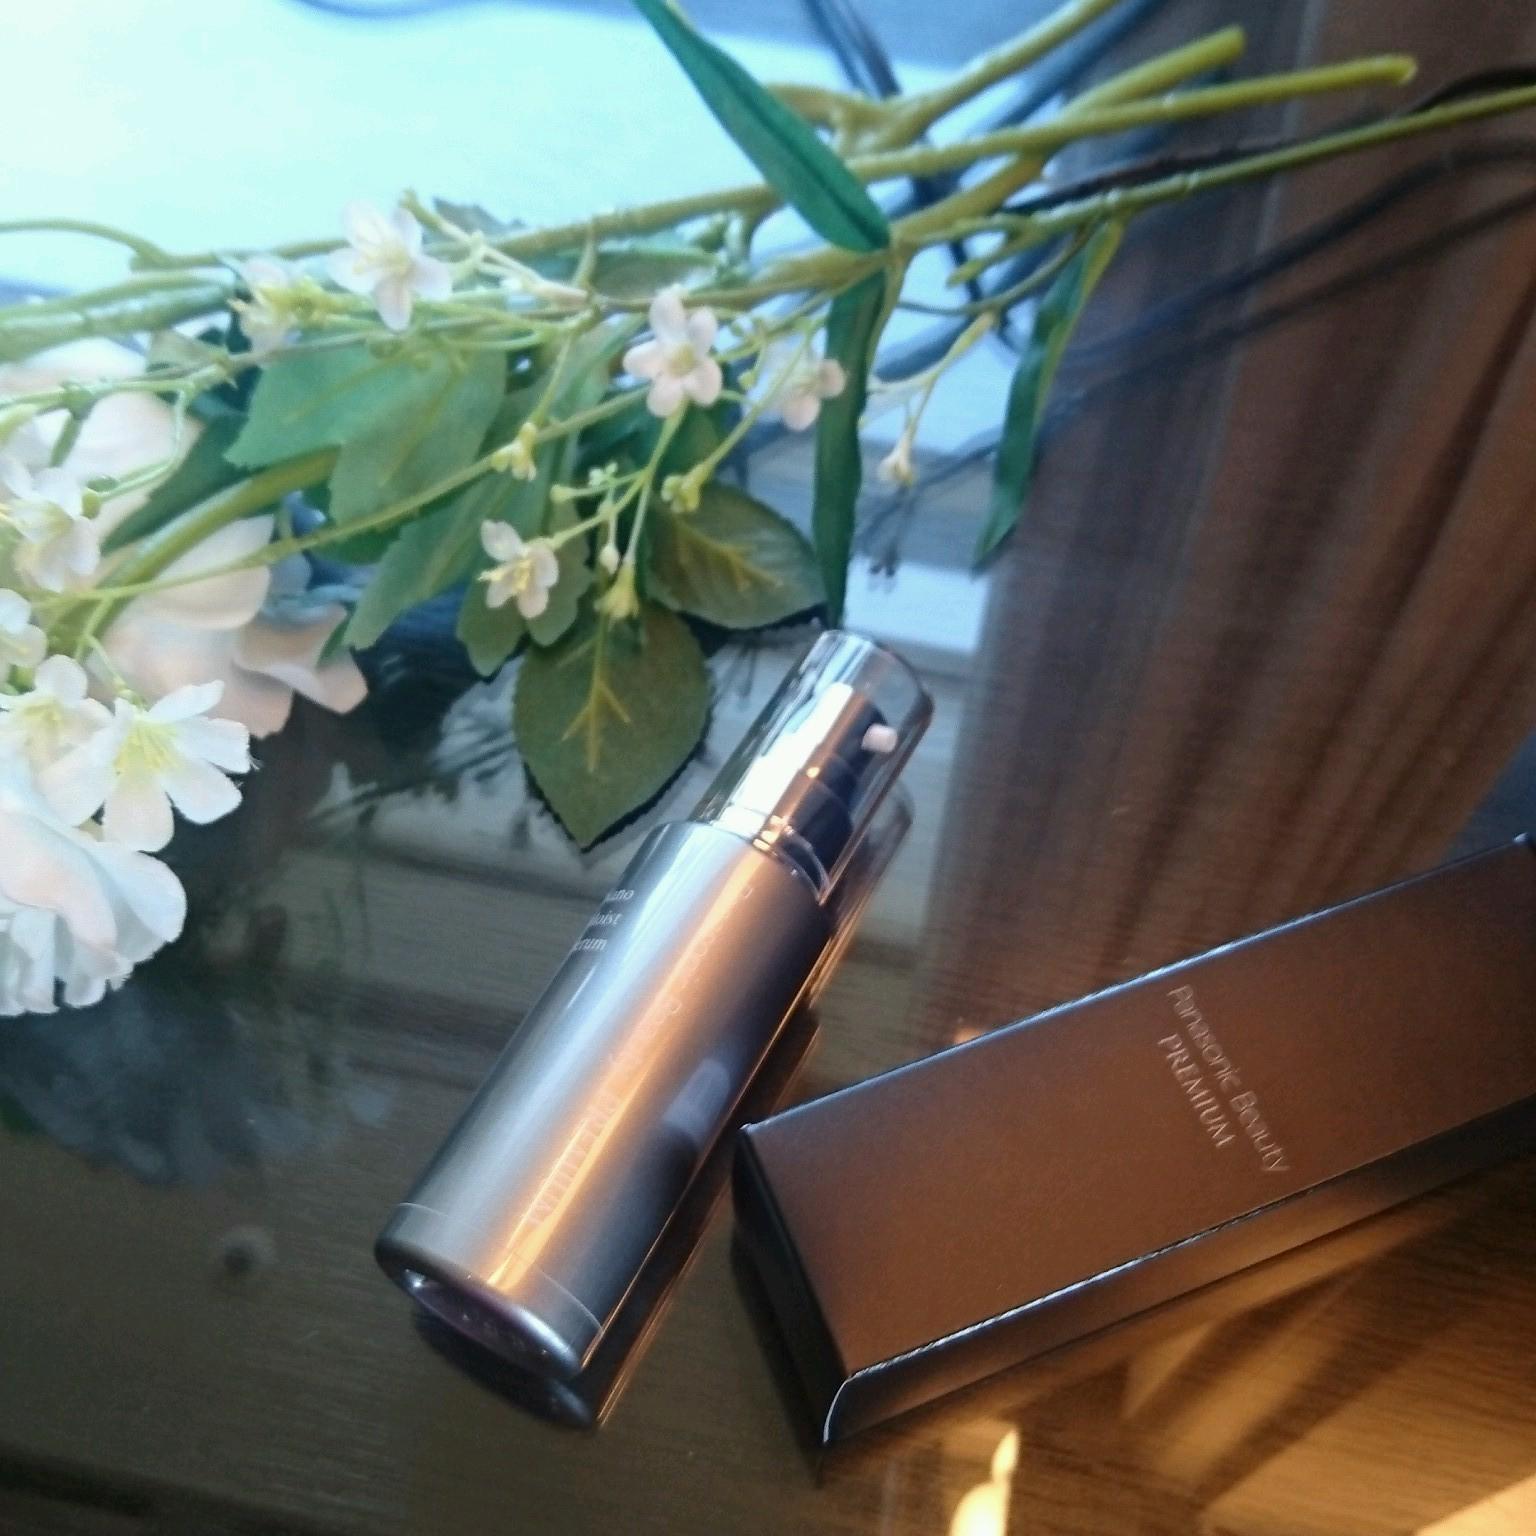 Panasonicから発売の美容家電&高機能化粧品を体験_1_4